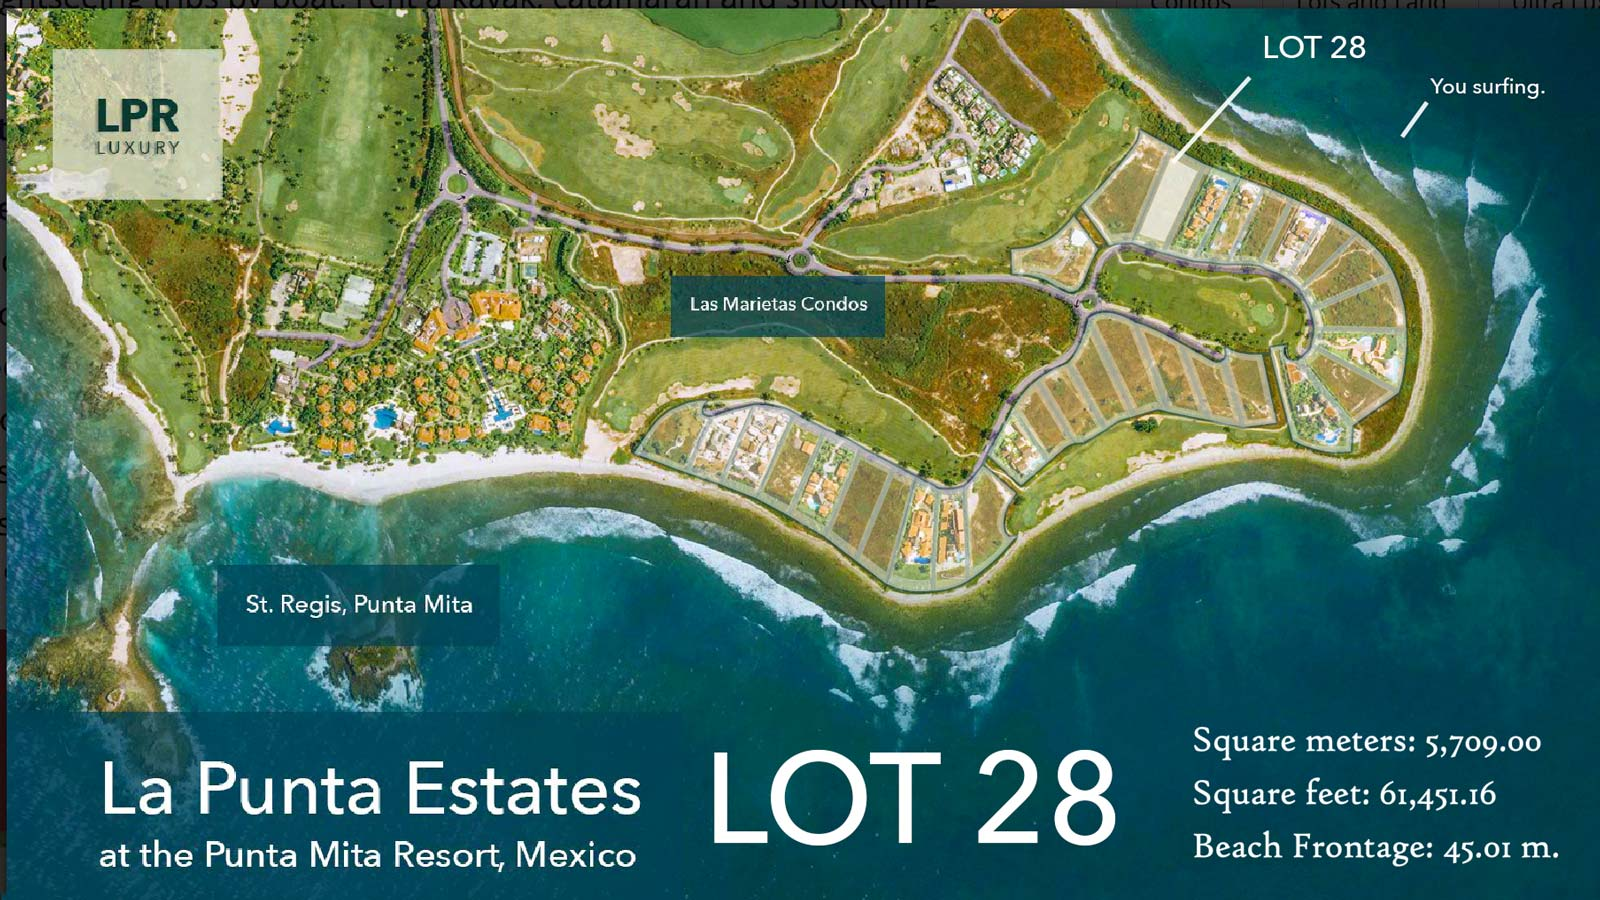 La Punta Estates - Lot 28 at the exclusive Punta Mita Resort, Riviera Nayarit, Mexico